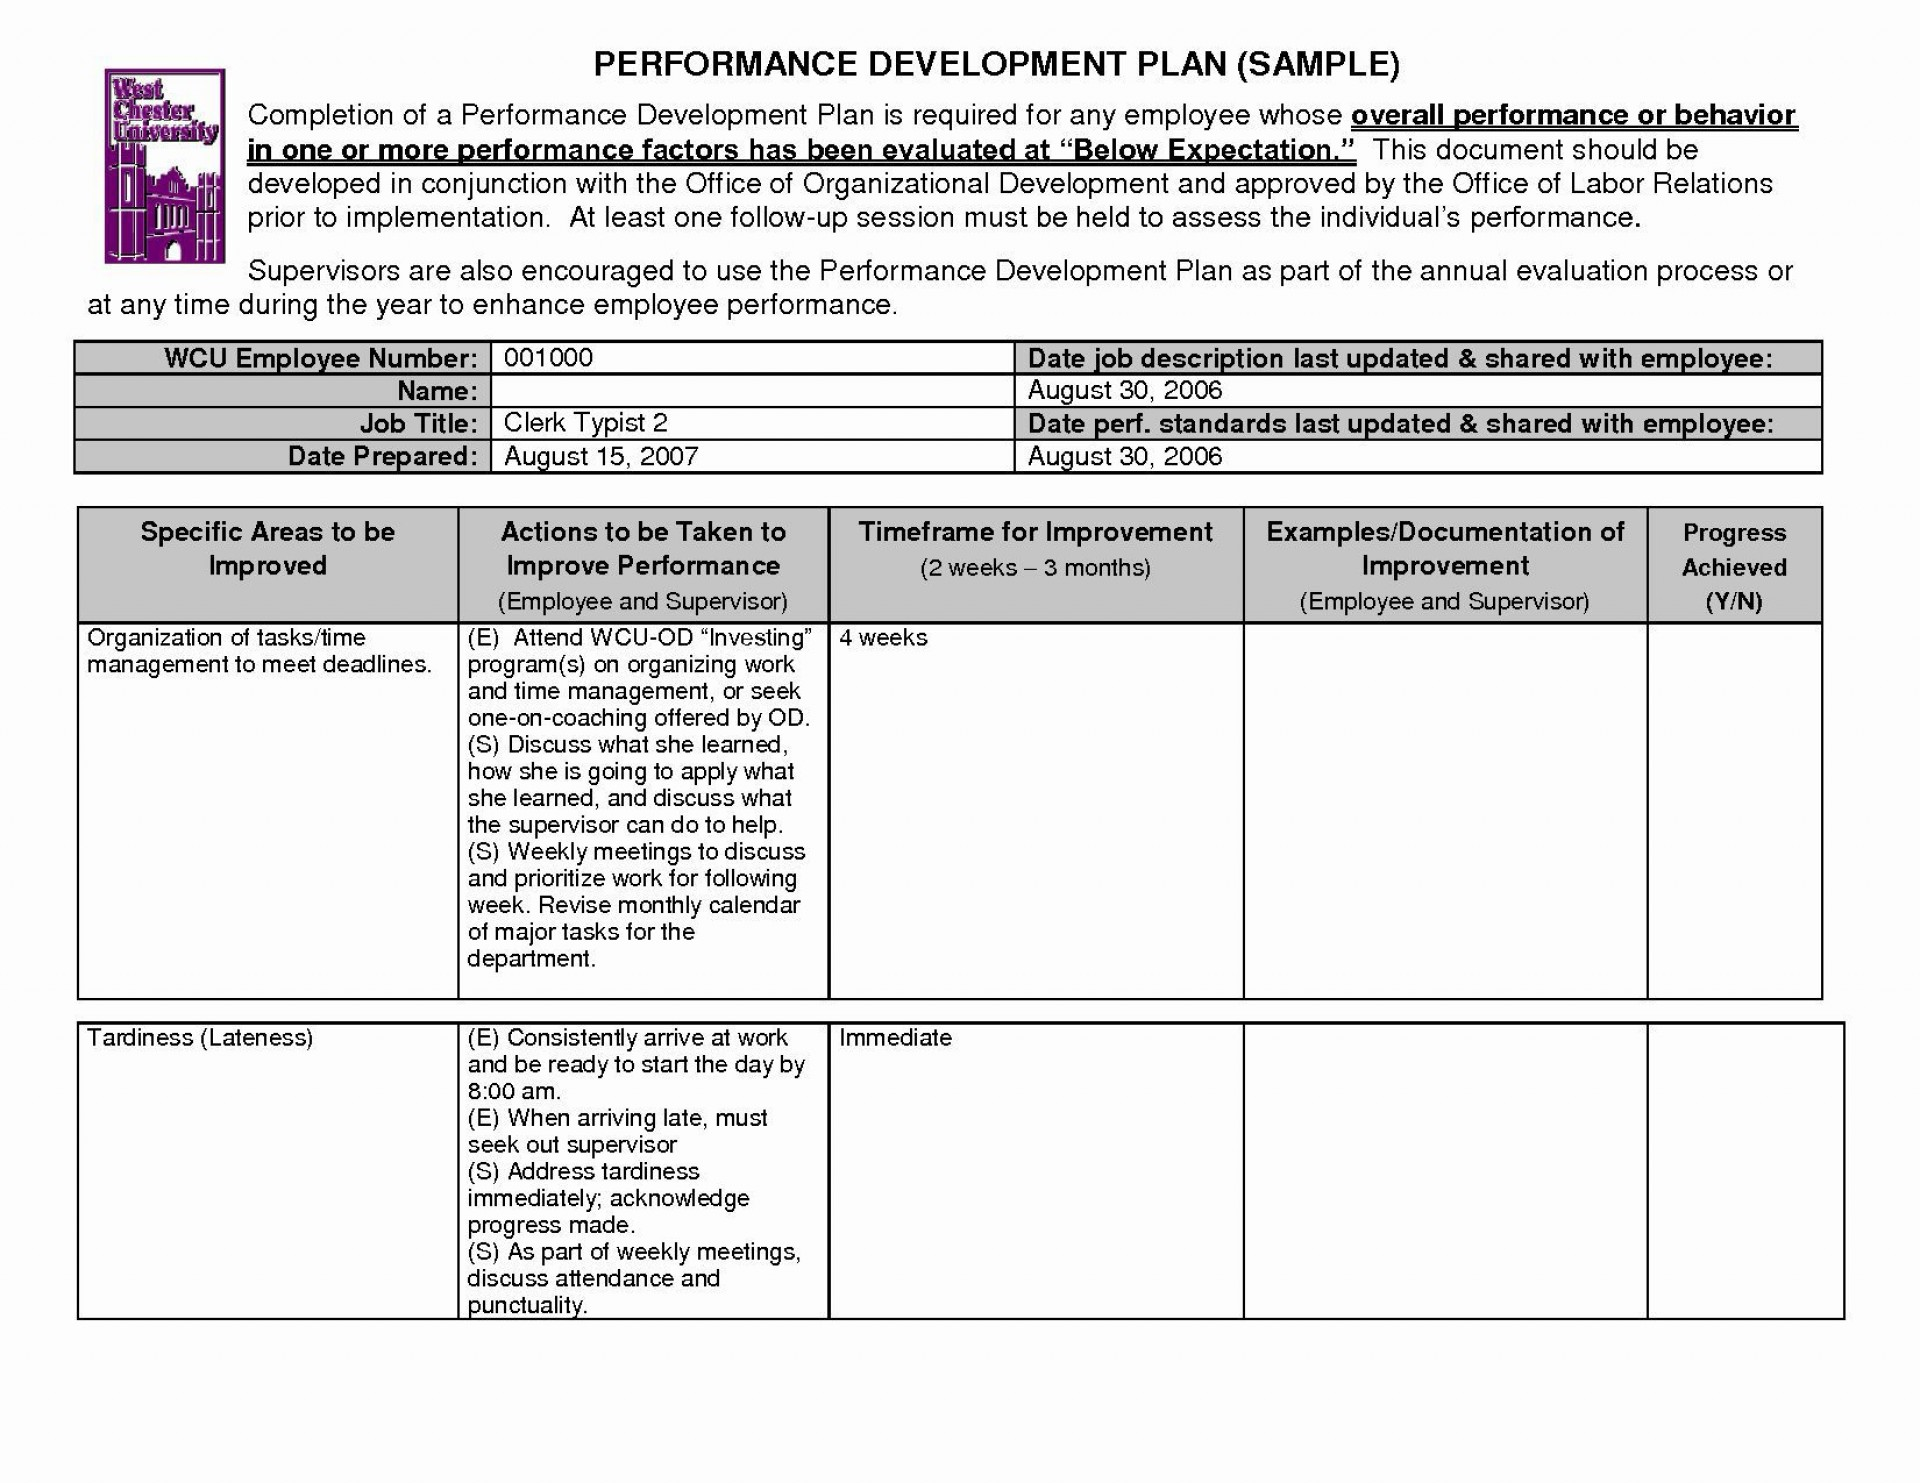 002 Amazing Employee Development Plan Goal Example High Resolution  Examples1920